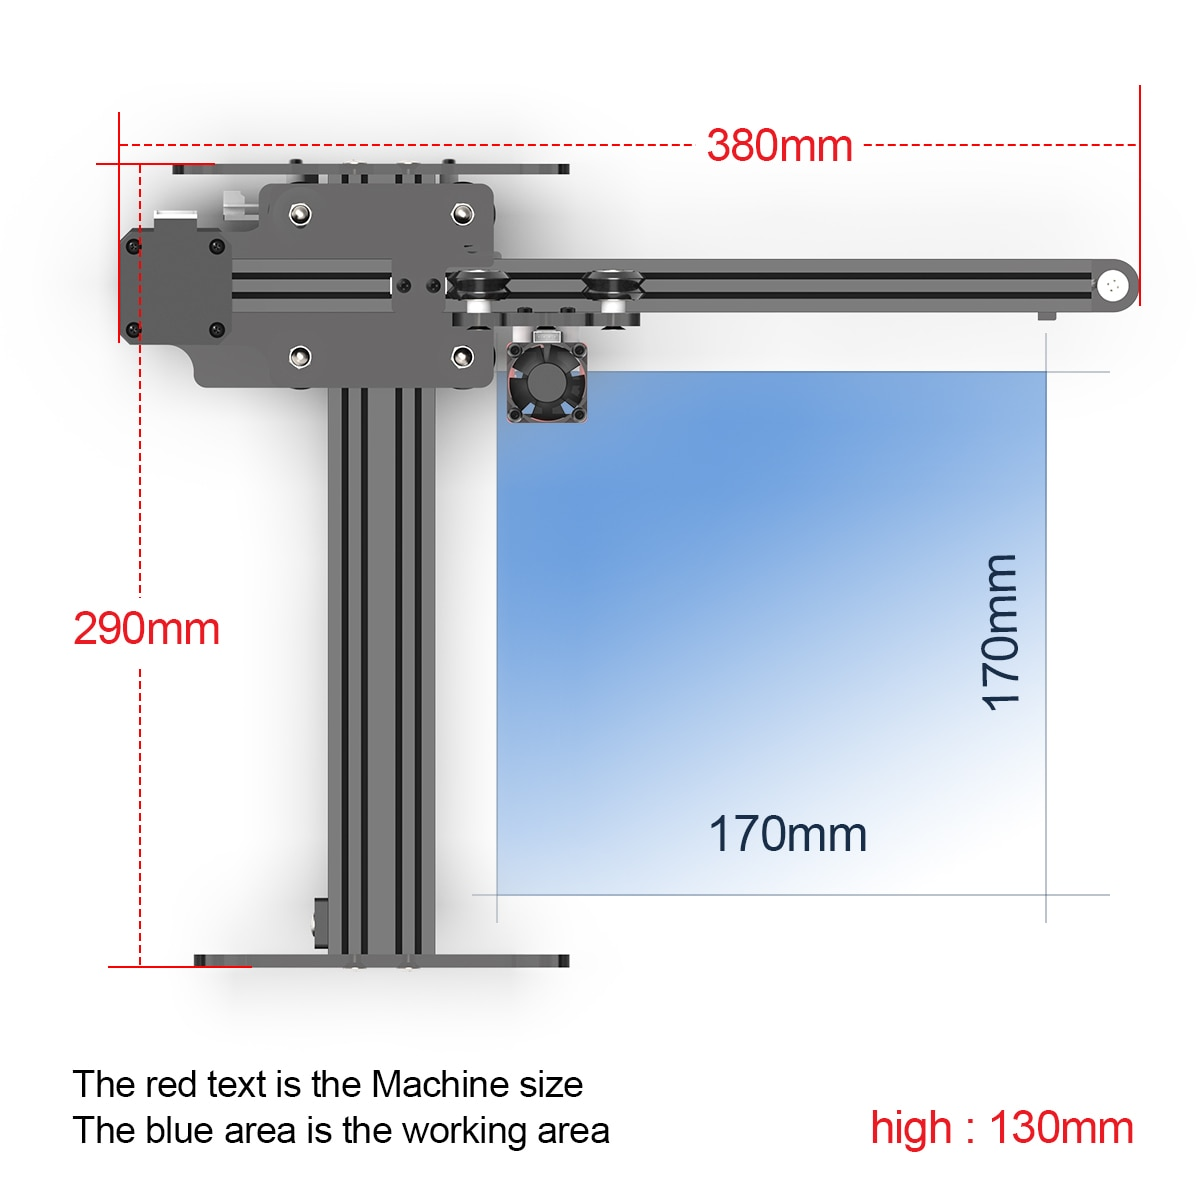 NEJE Master 2S 30W Desktop CNC Laser Engraver 170X170mm Wireless Laser Printer Engraving Cutting Machine App Control Lightburn enlarge